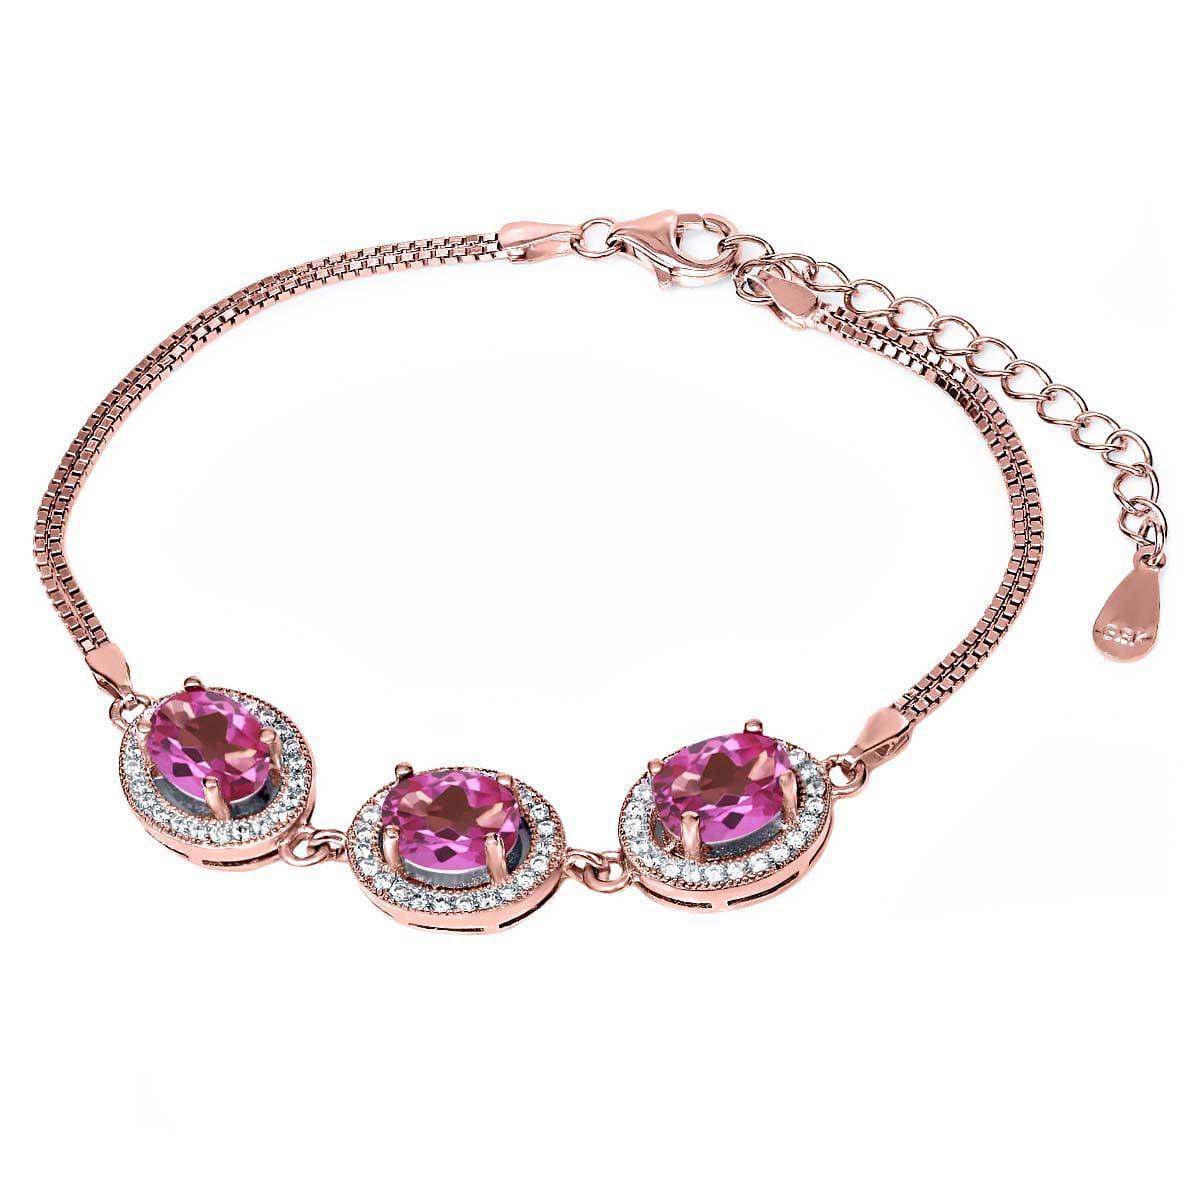 9.55 Ct Oval Pink Mystic Topaz 18K Rose Gold Plated Silver Bracelet by